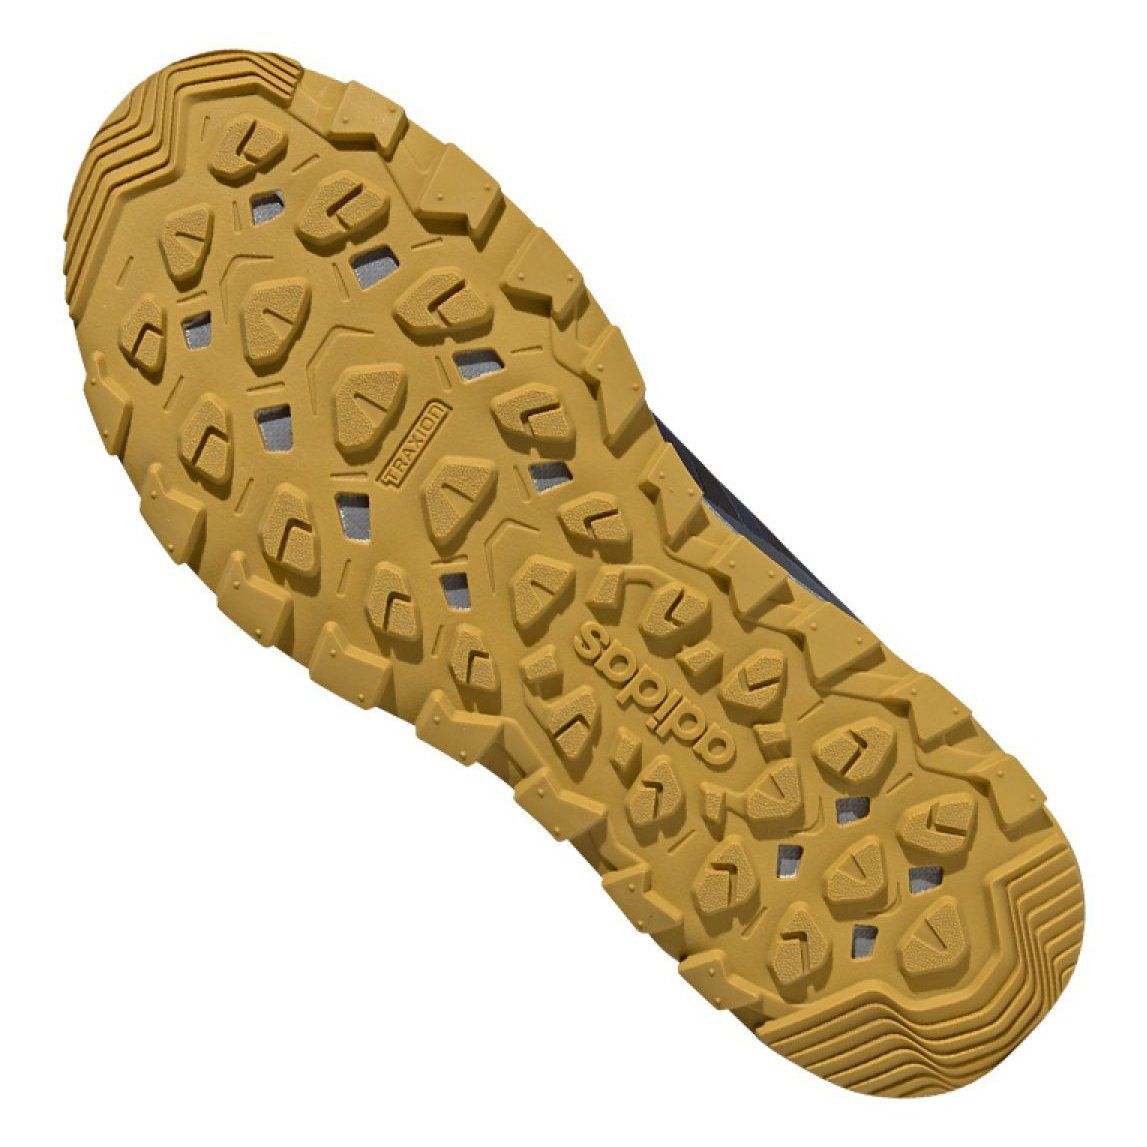 Buty Biegowe Adidas Resopnse Trail M Ee9829 Granatowe Wielokolorowe Adidas Running Shoes Running Shoes Adidas Shoes